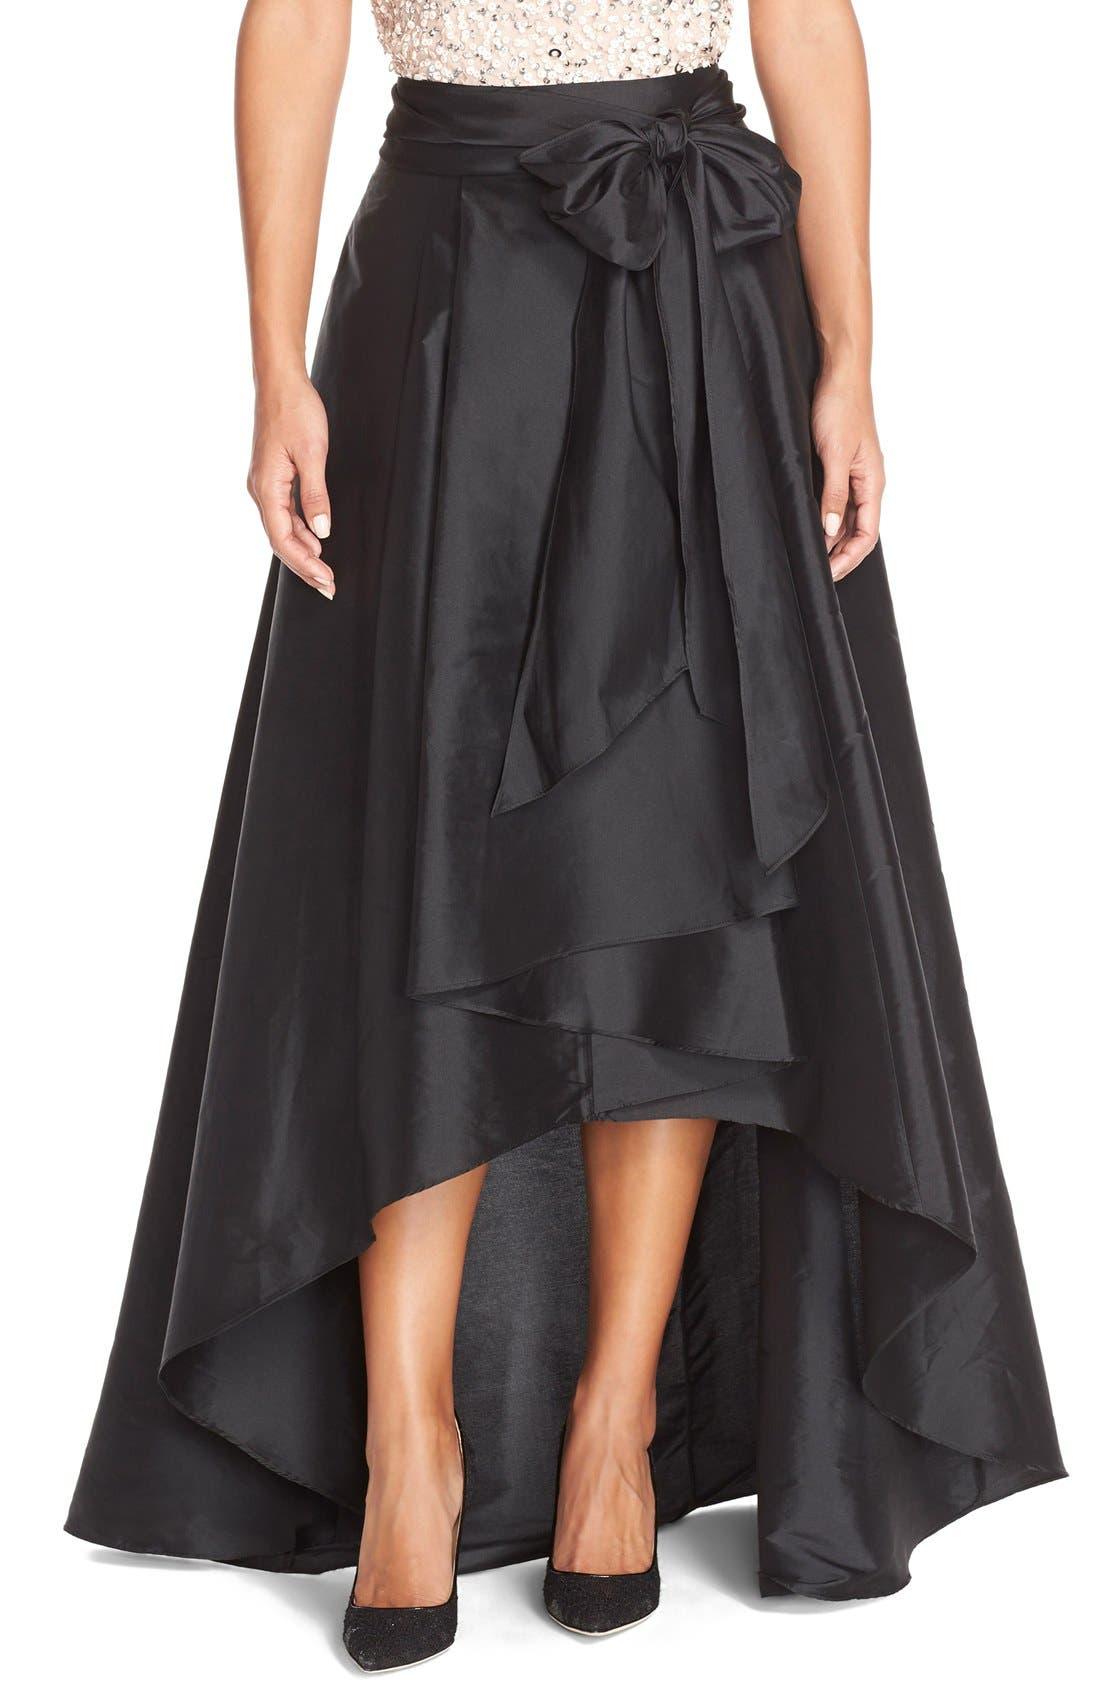 ADRIANNA PAPELL, High/Low Taffeta Ball Skirt, Alternate thumbnail 6, color, 001